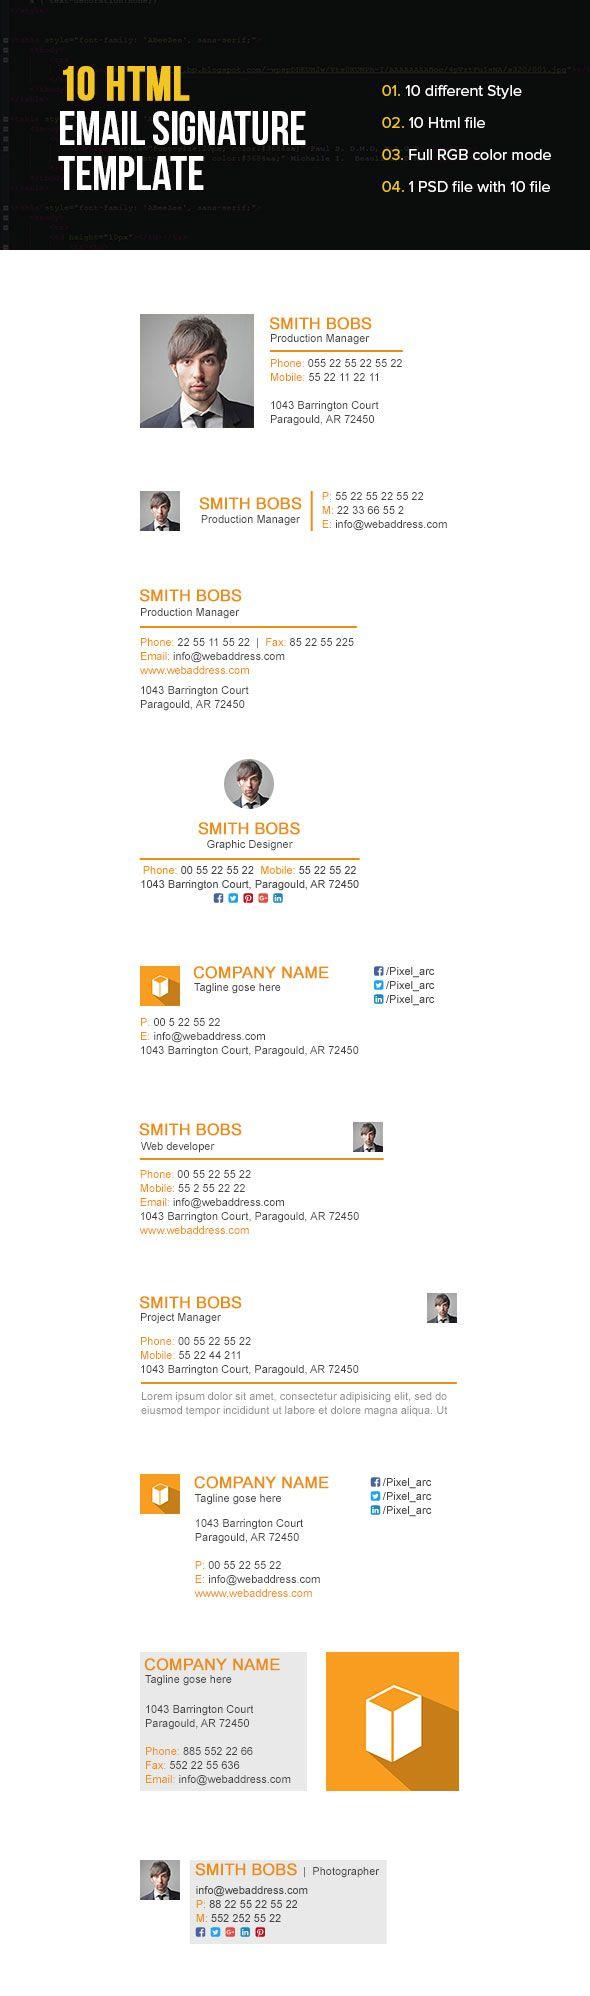 Responsive Email Signature Template | Email signature templates ...